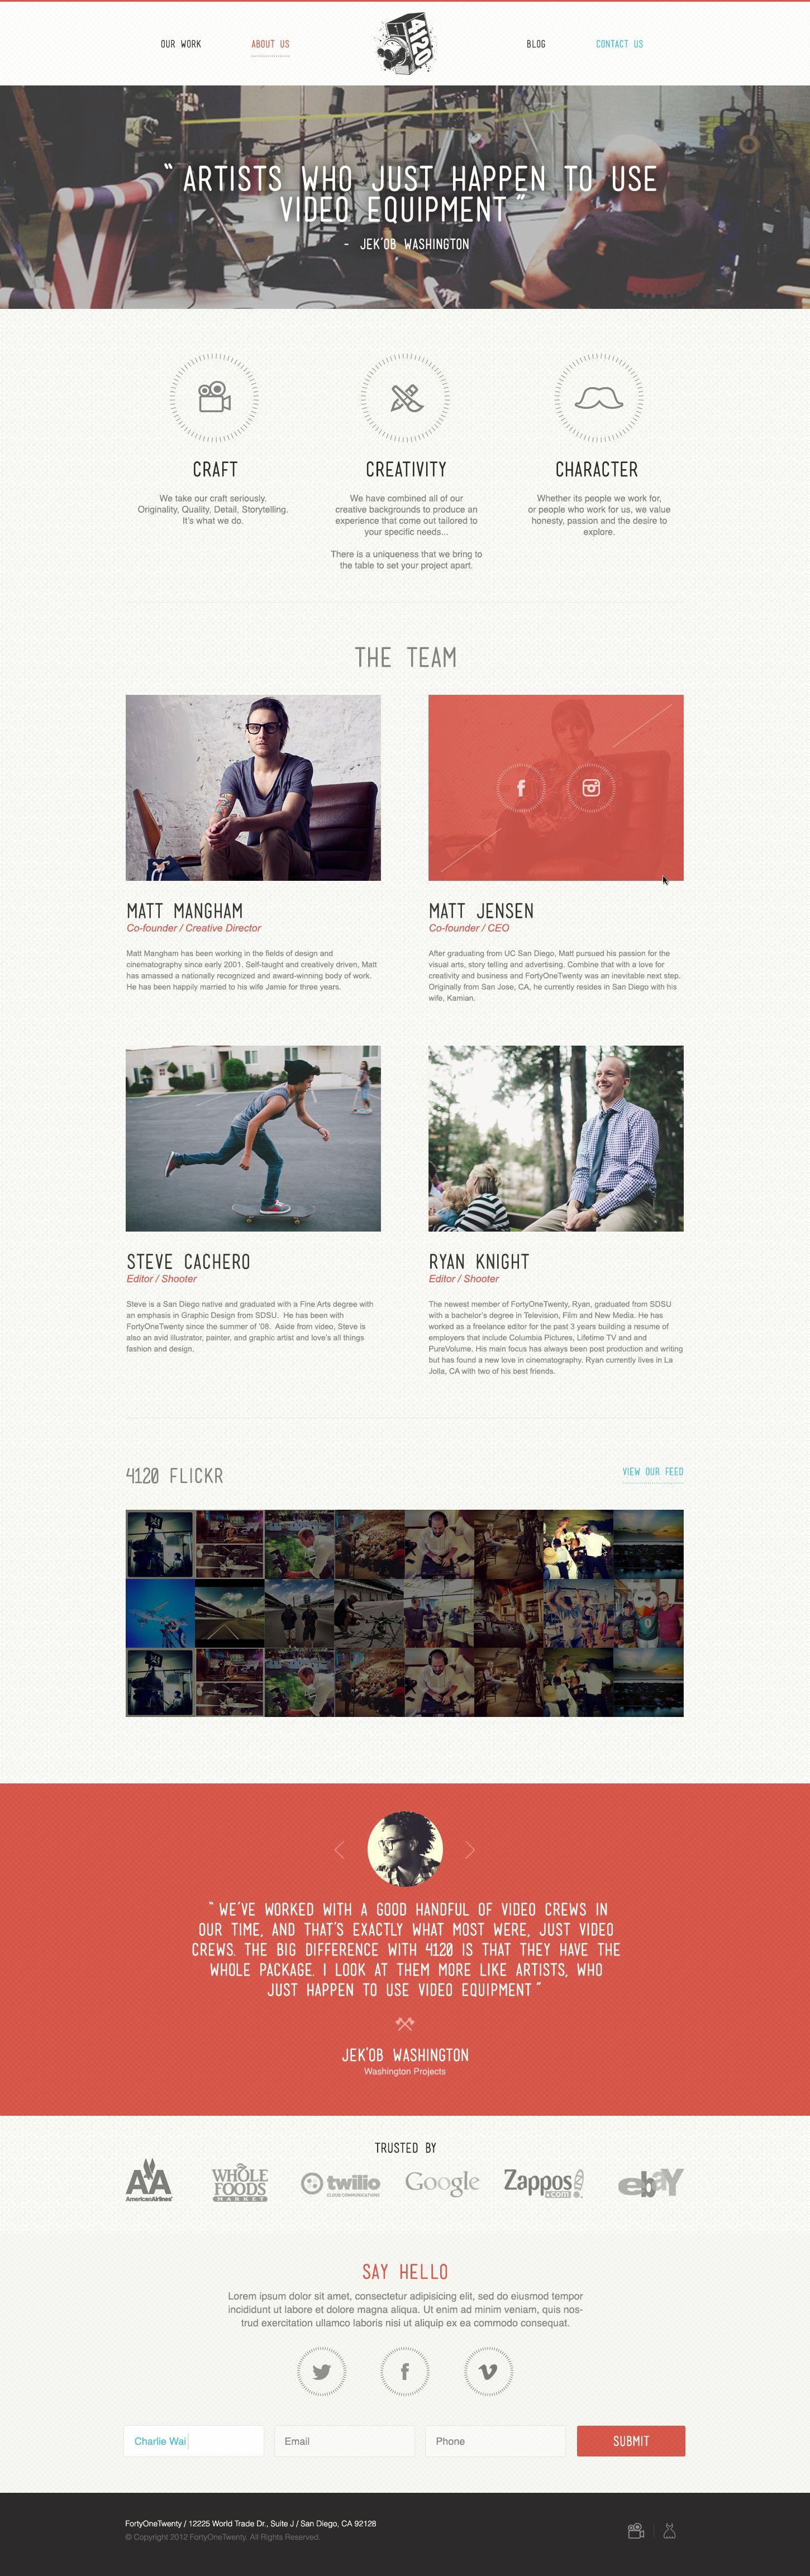 15 Beautiful Examples Of Web Design Inspiration Part 3 Web Design Inspiration Web Development Design Web Layout Design